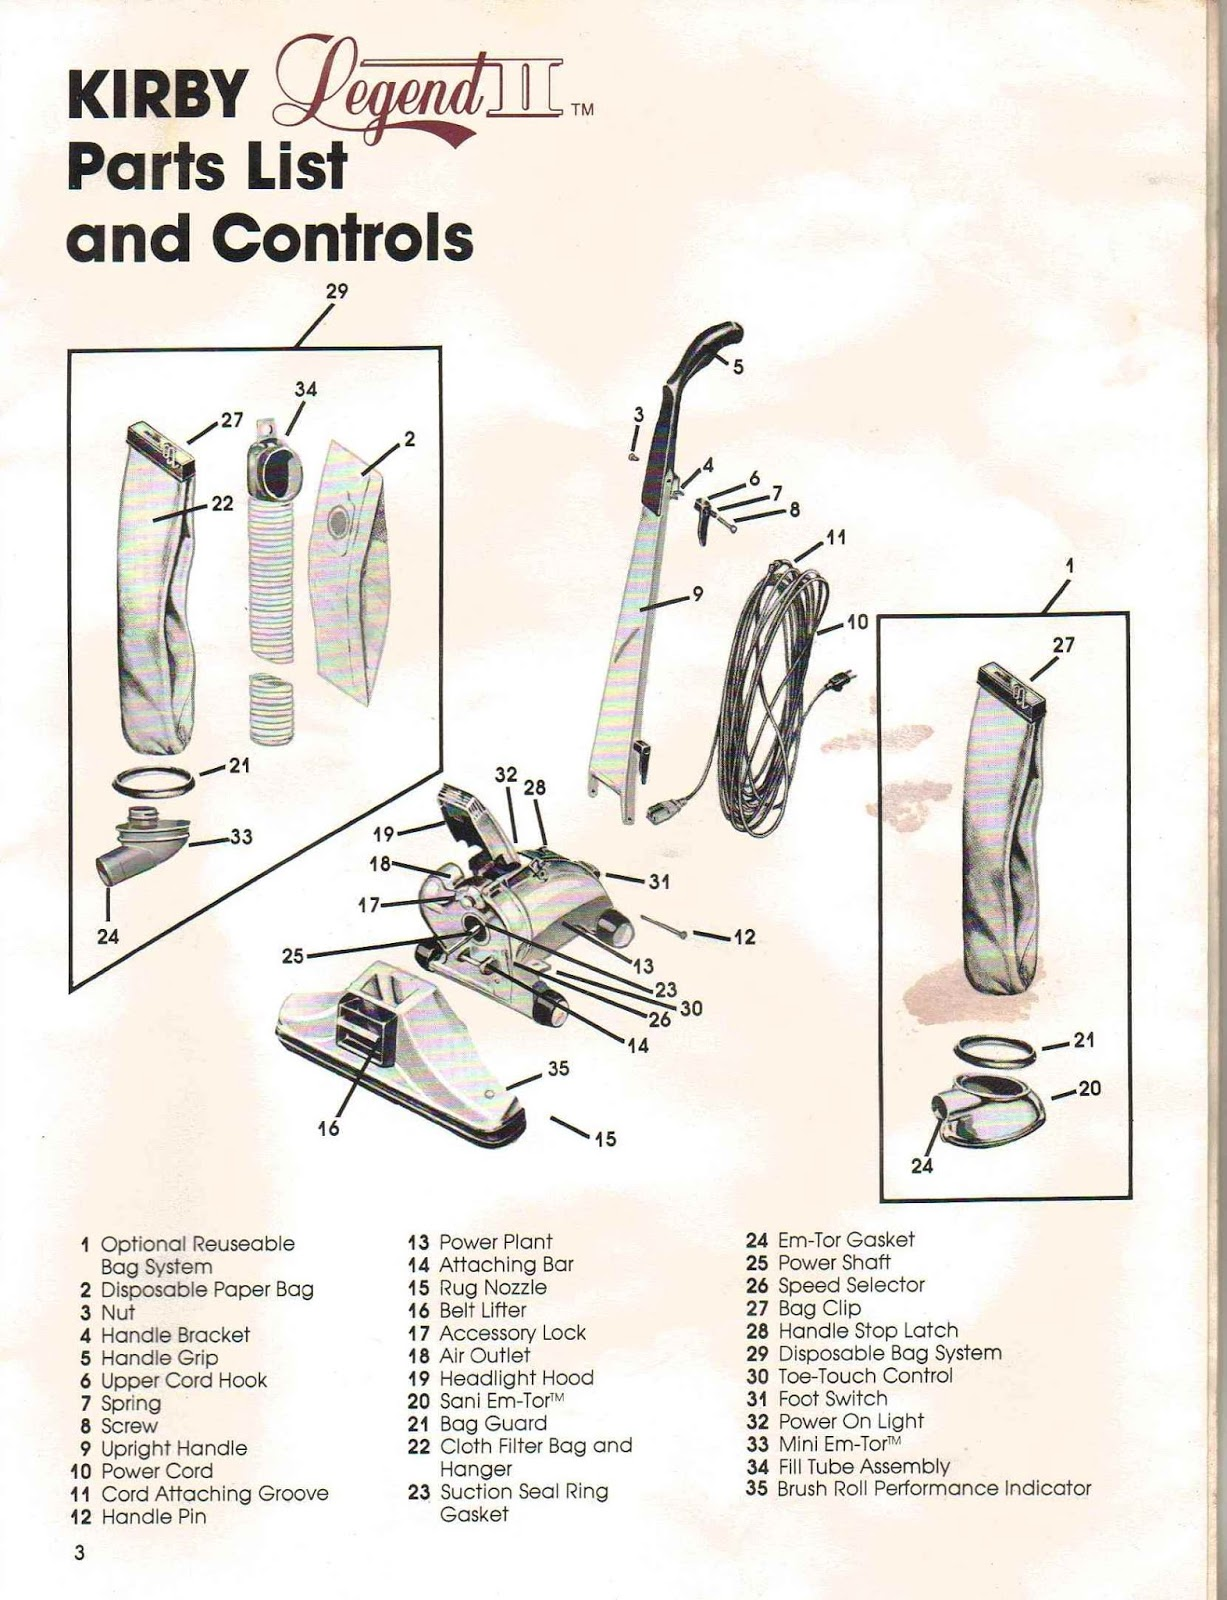 Kirby Vacuum Parts Diagram : kirby, vacuum, parts, diagram, Kirby, Instruction, Manual, Heritage, Legend